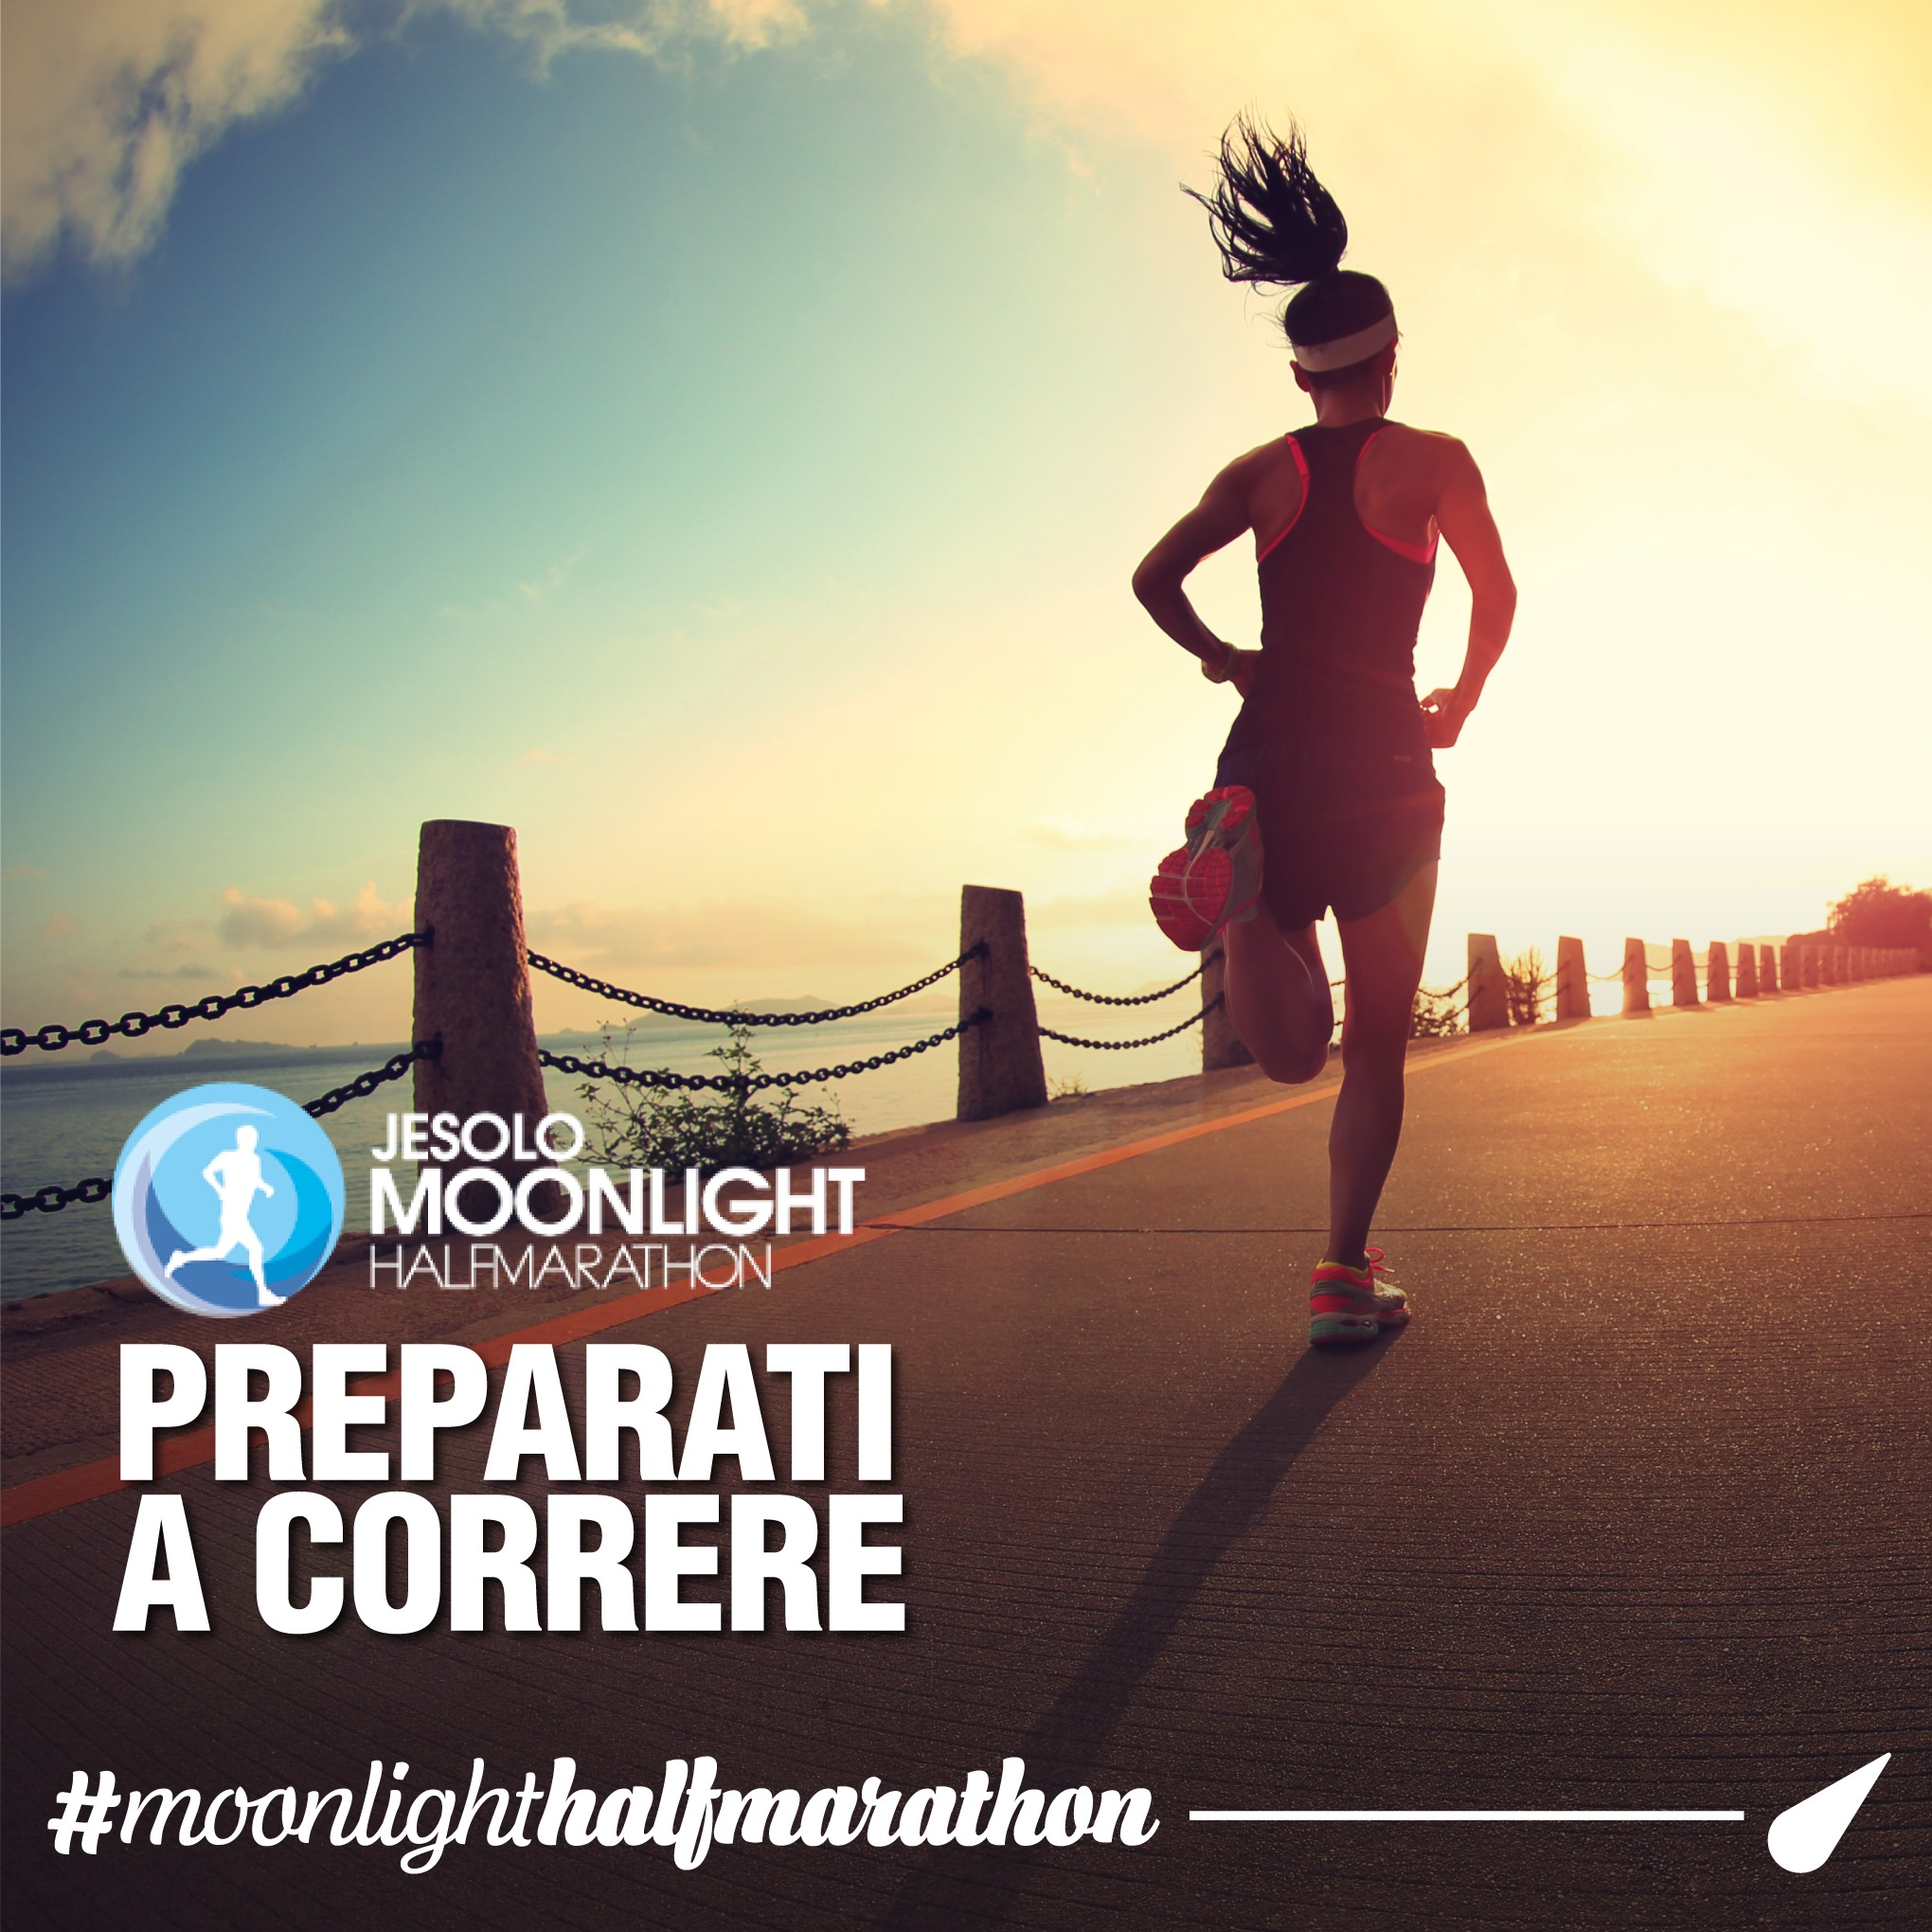 Tutto pronto  per la Moonlight Half Marathon